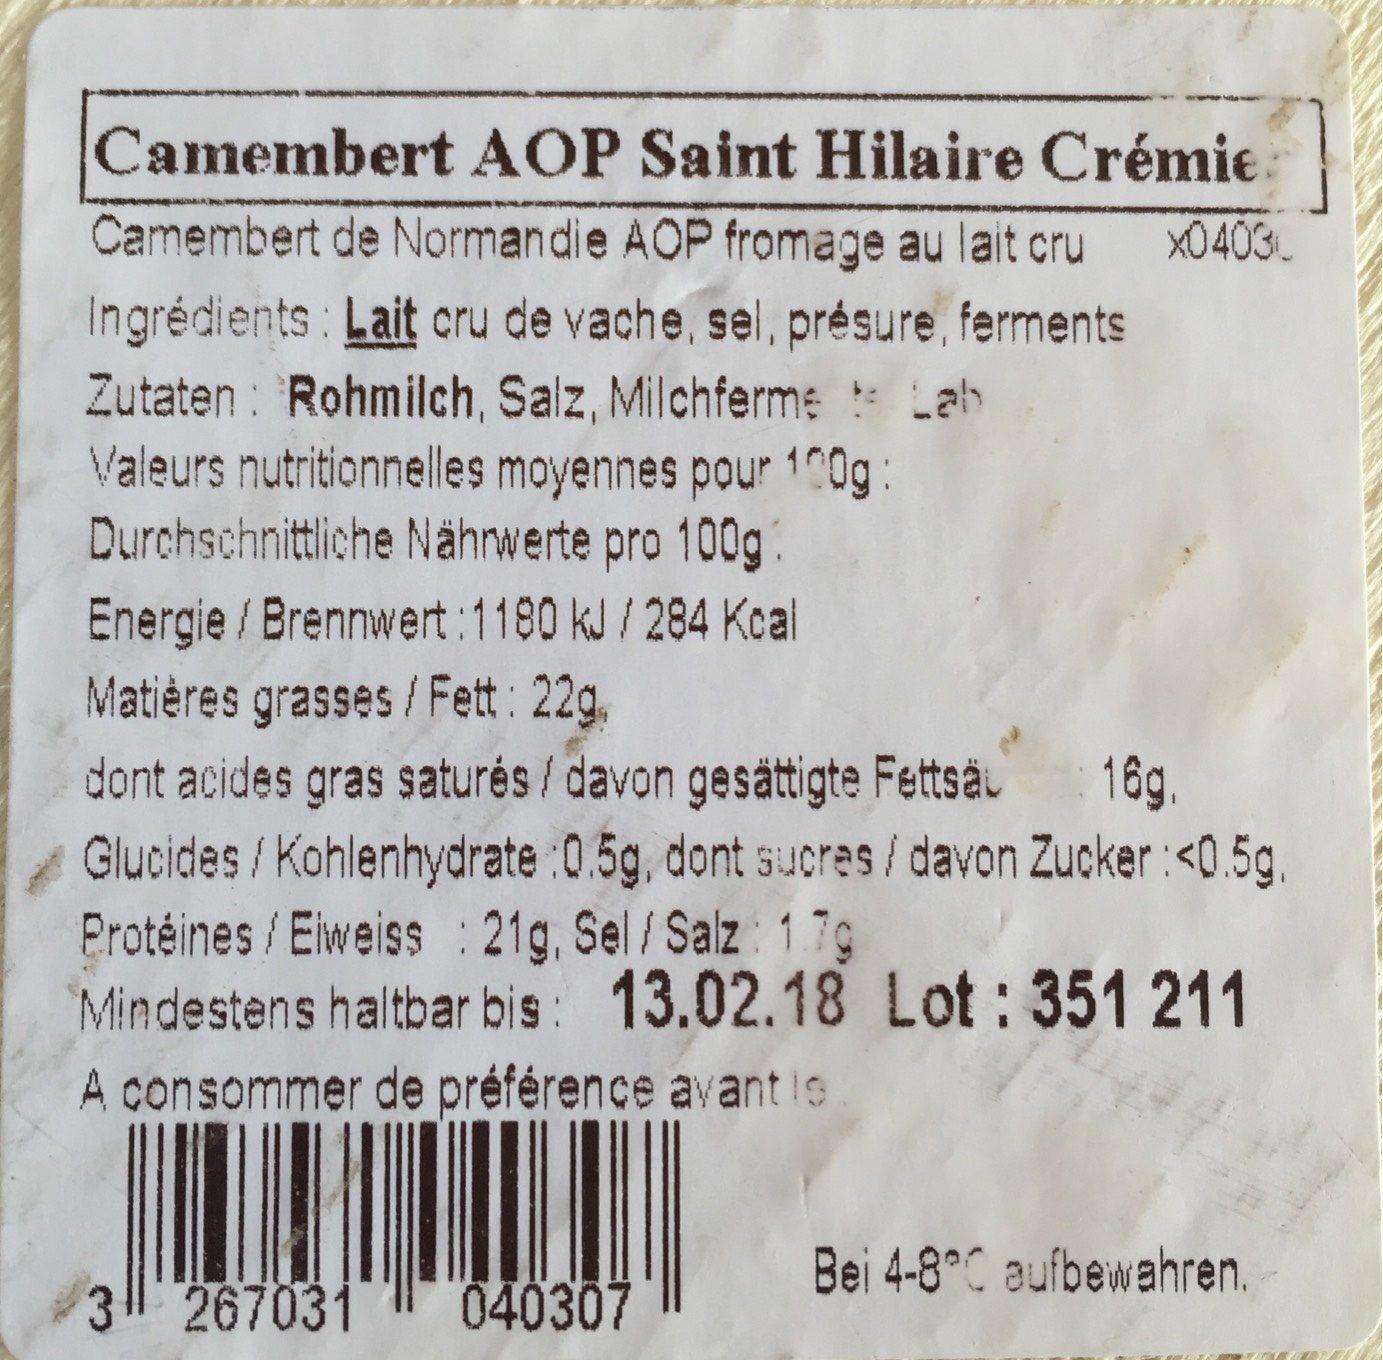 Camenbert de normandie - Nutrition facts - fr